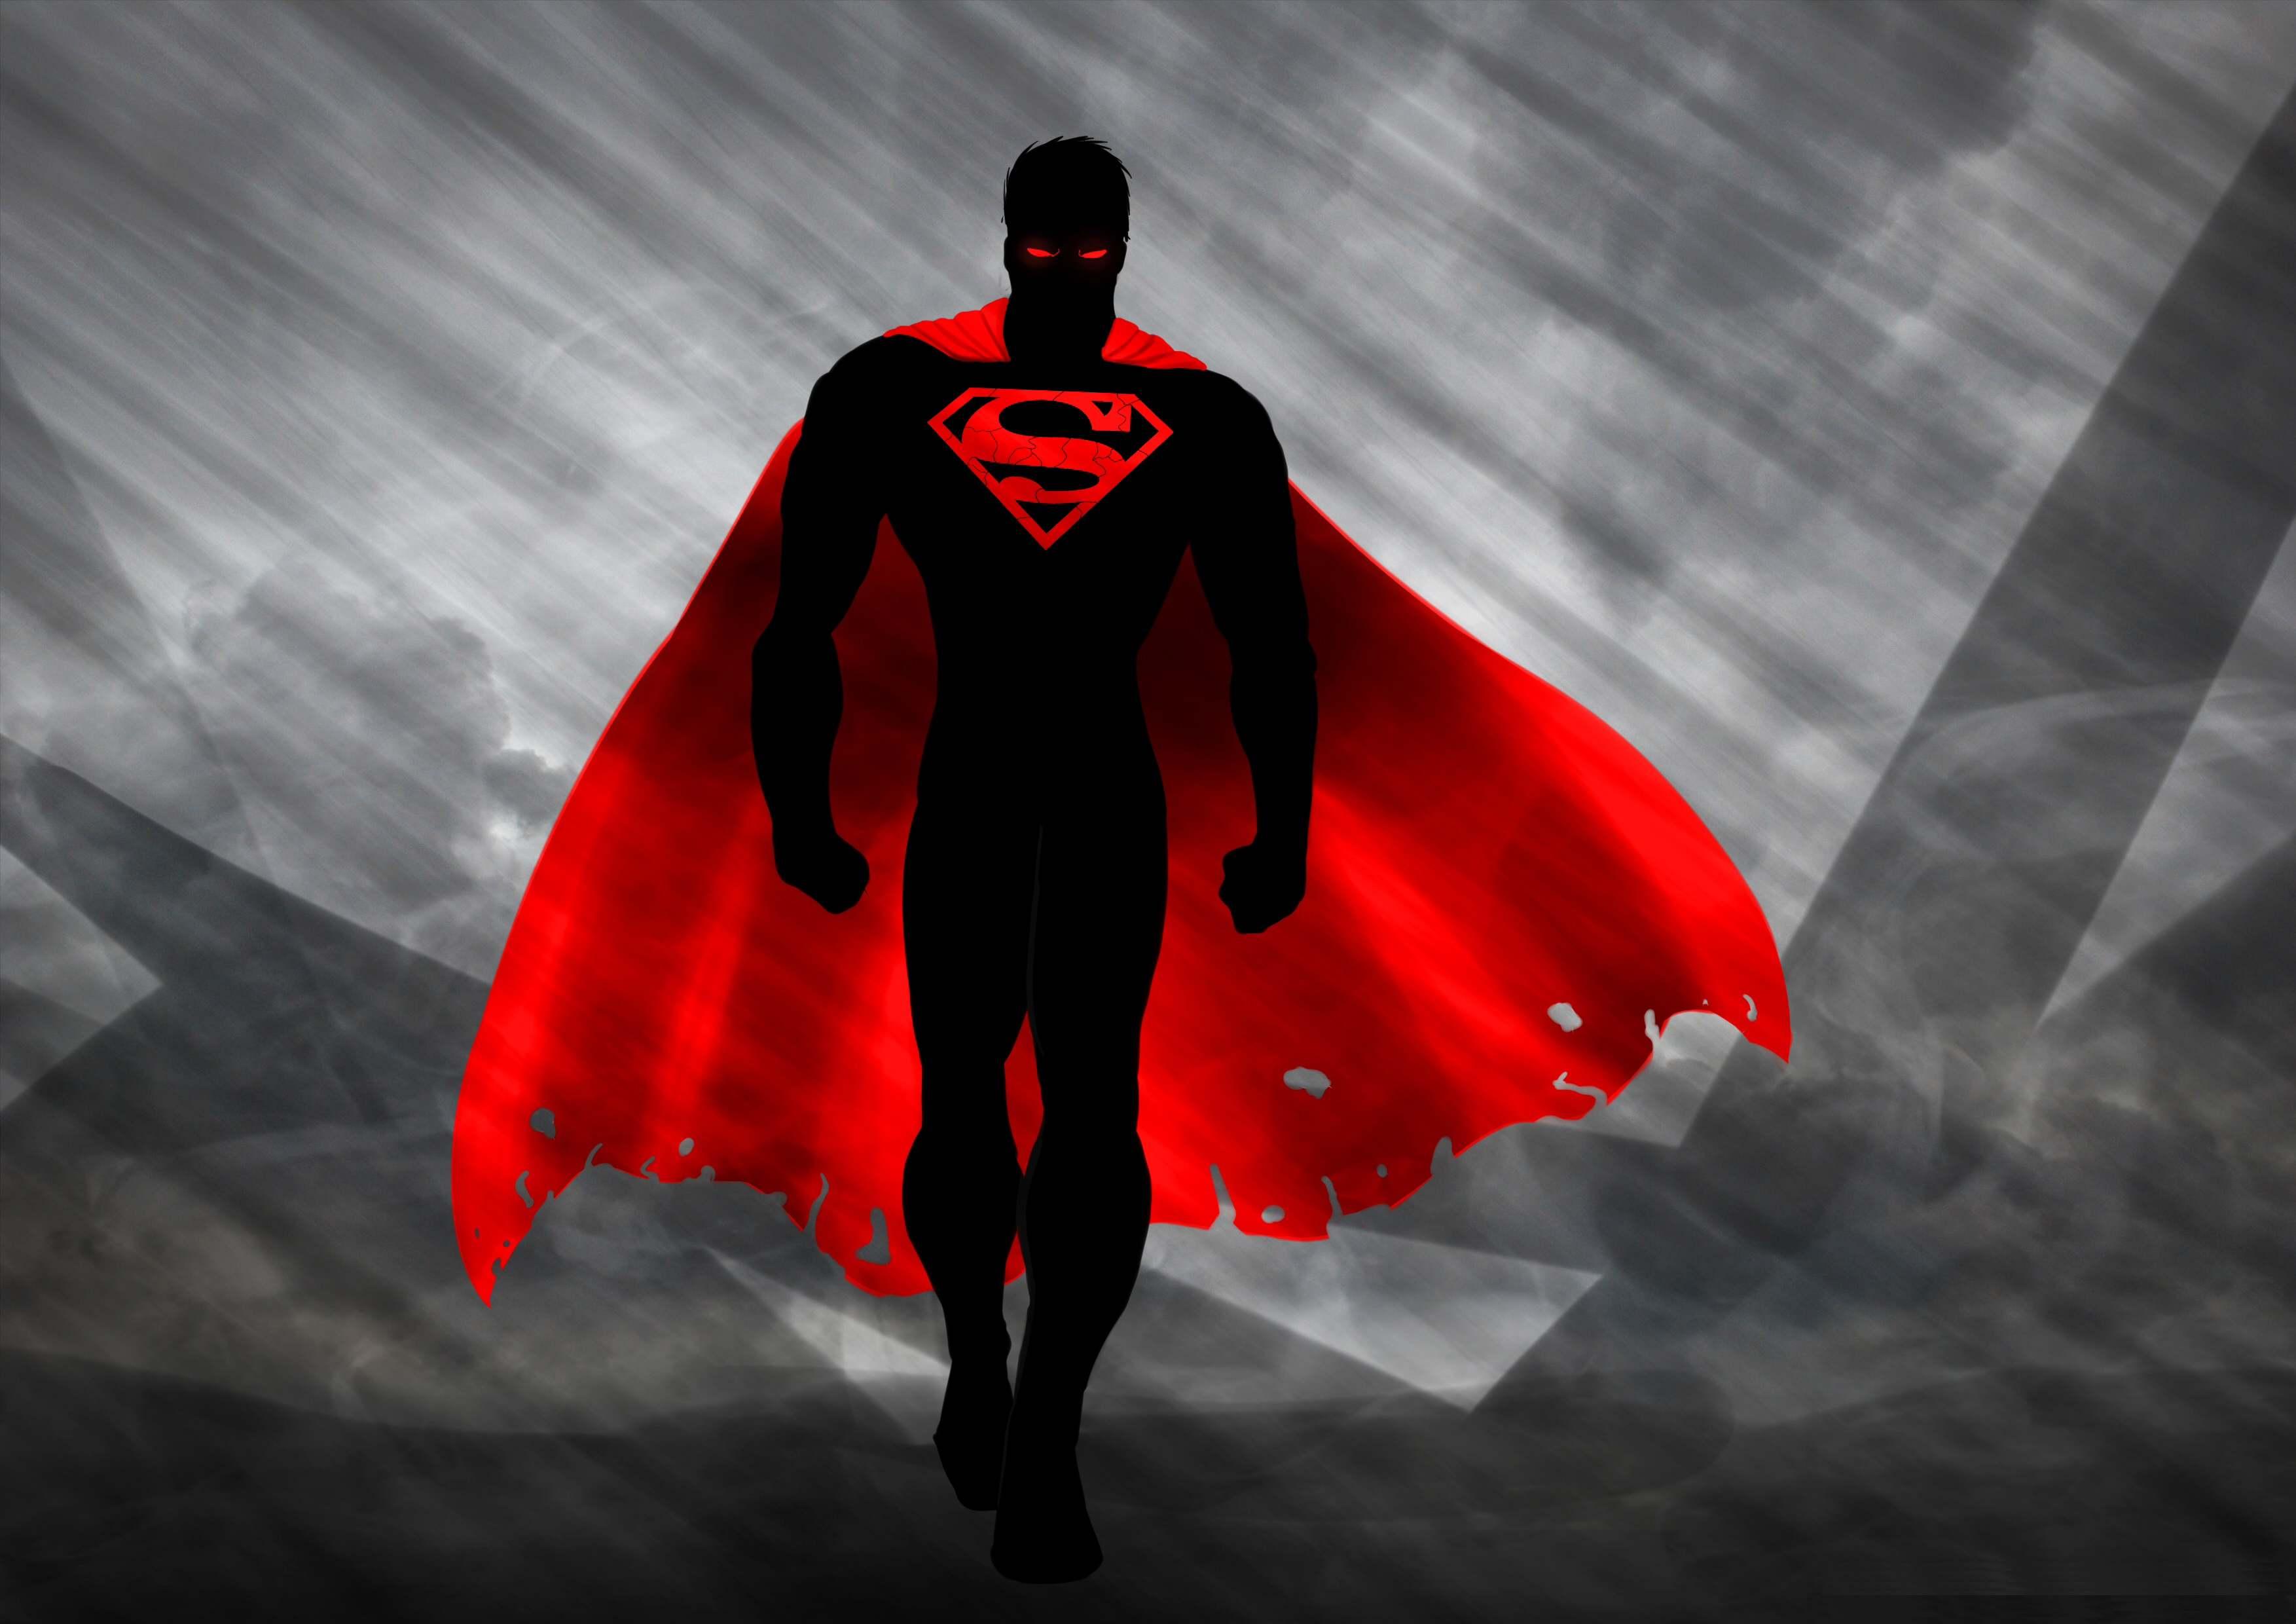 Superhero Wallpaper HD 3507x2480